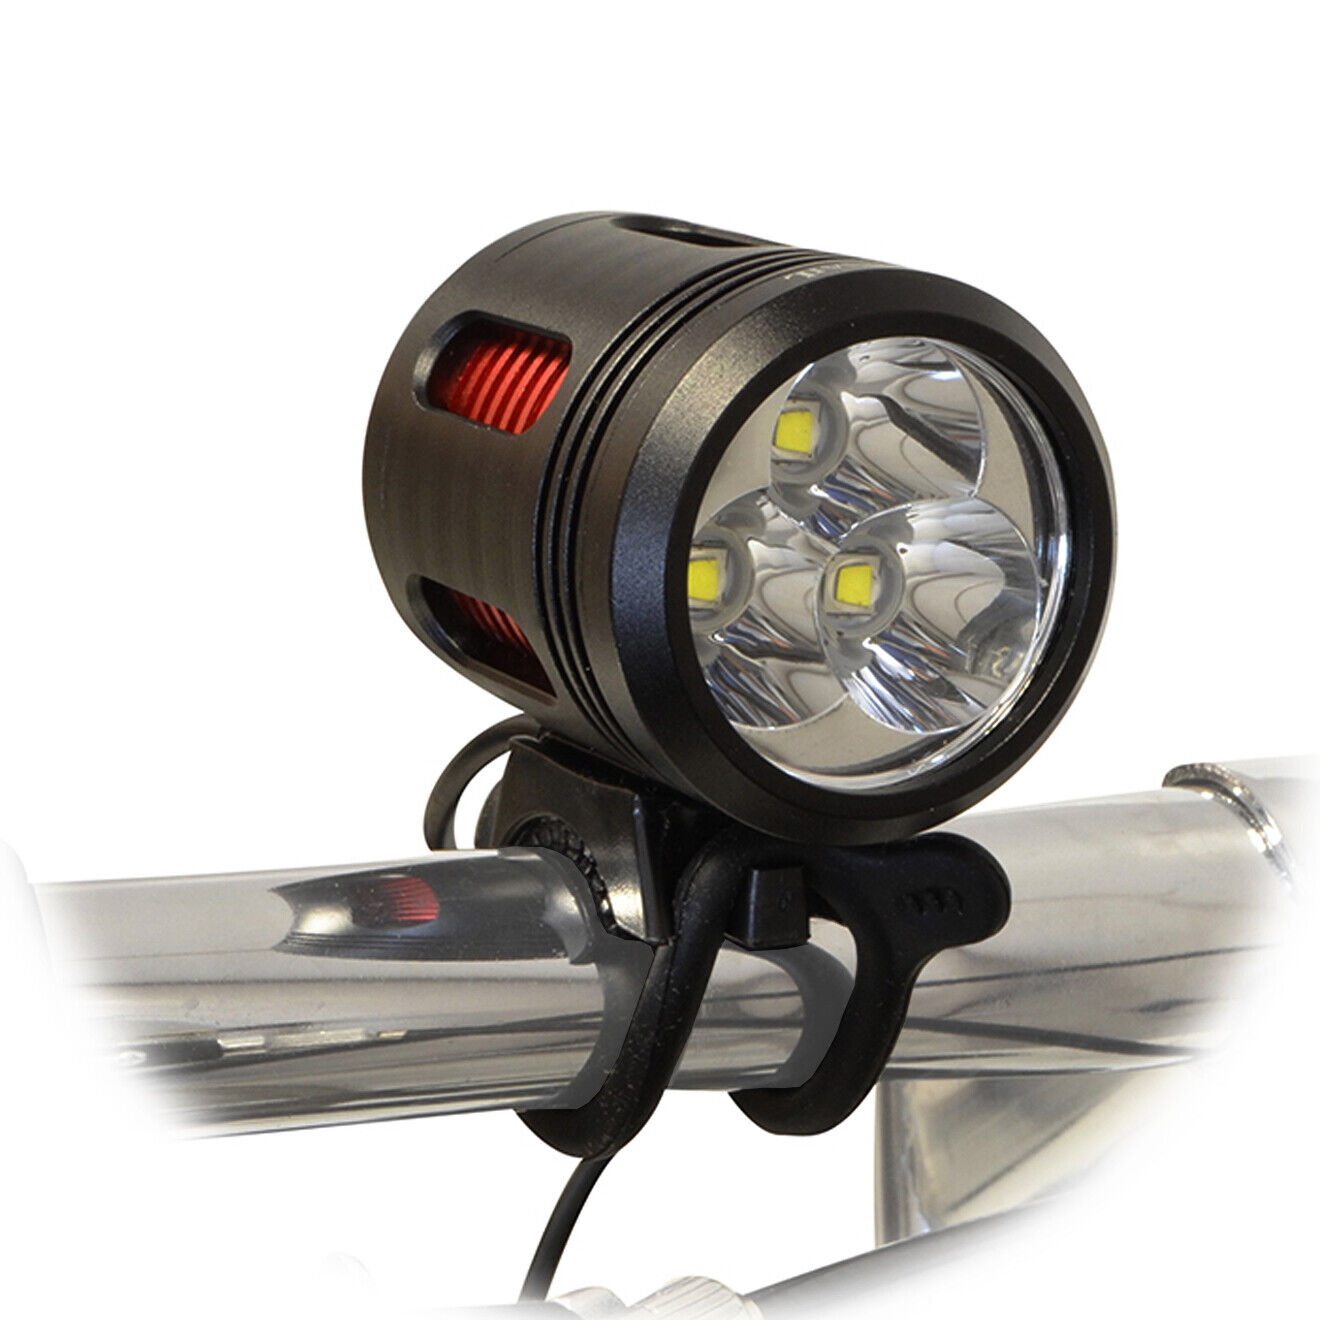 Lumintrail 3000 Lumen LED Bike Headlight USB Rechargeable wi